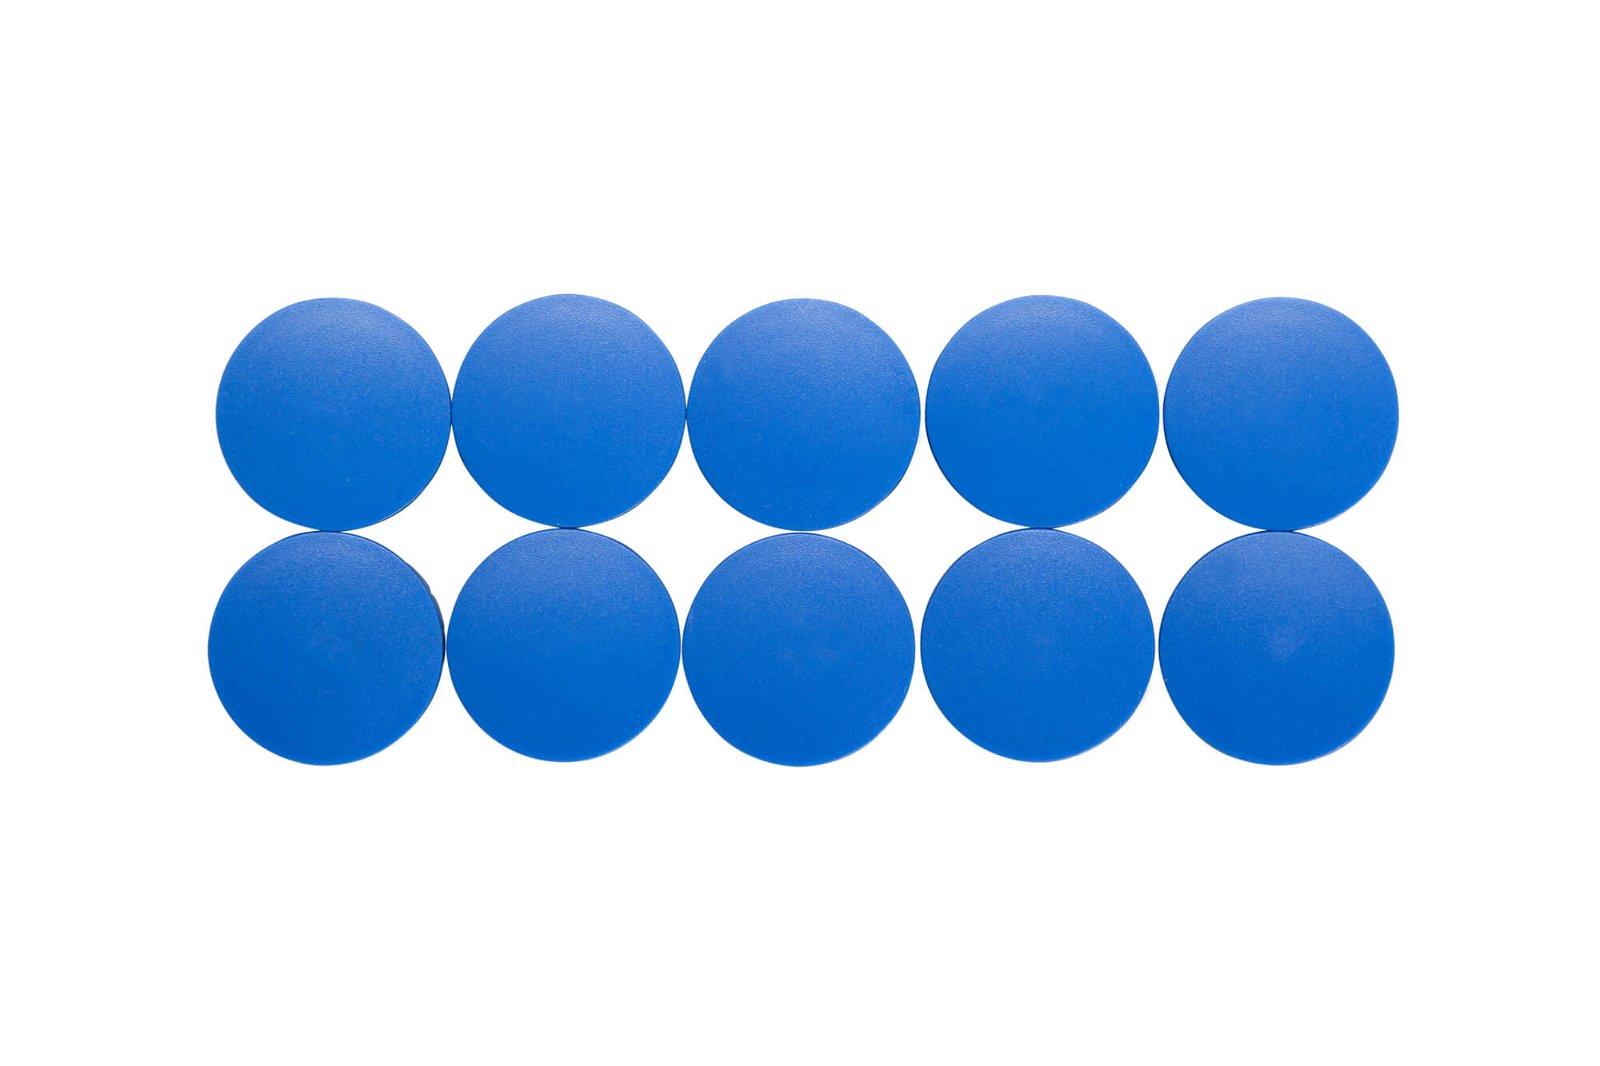 Magnet MAULsolid Ø 38 mm, 2,5 kg Haftkraft, 10 St./Ktn., blau